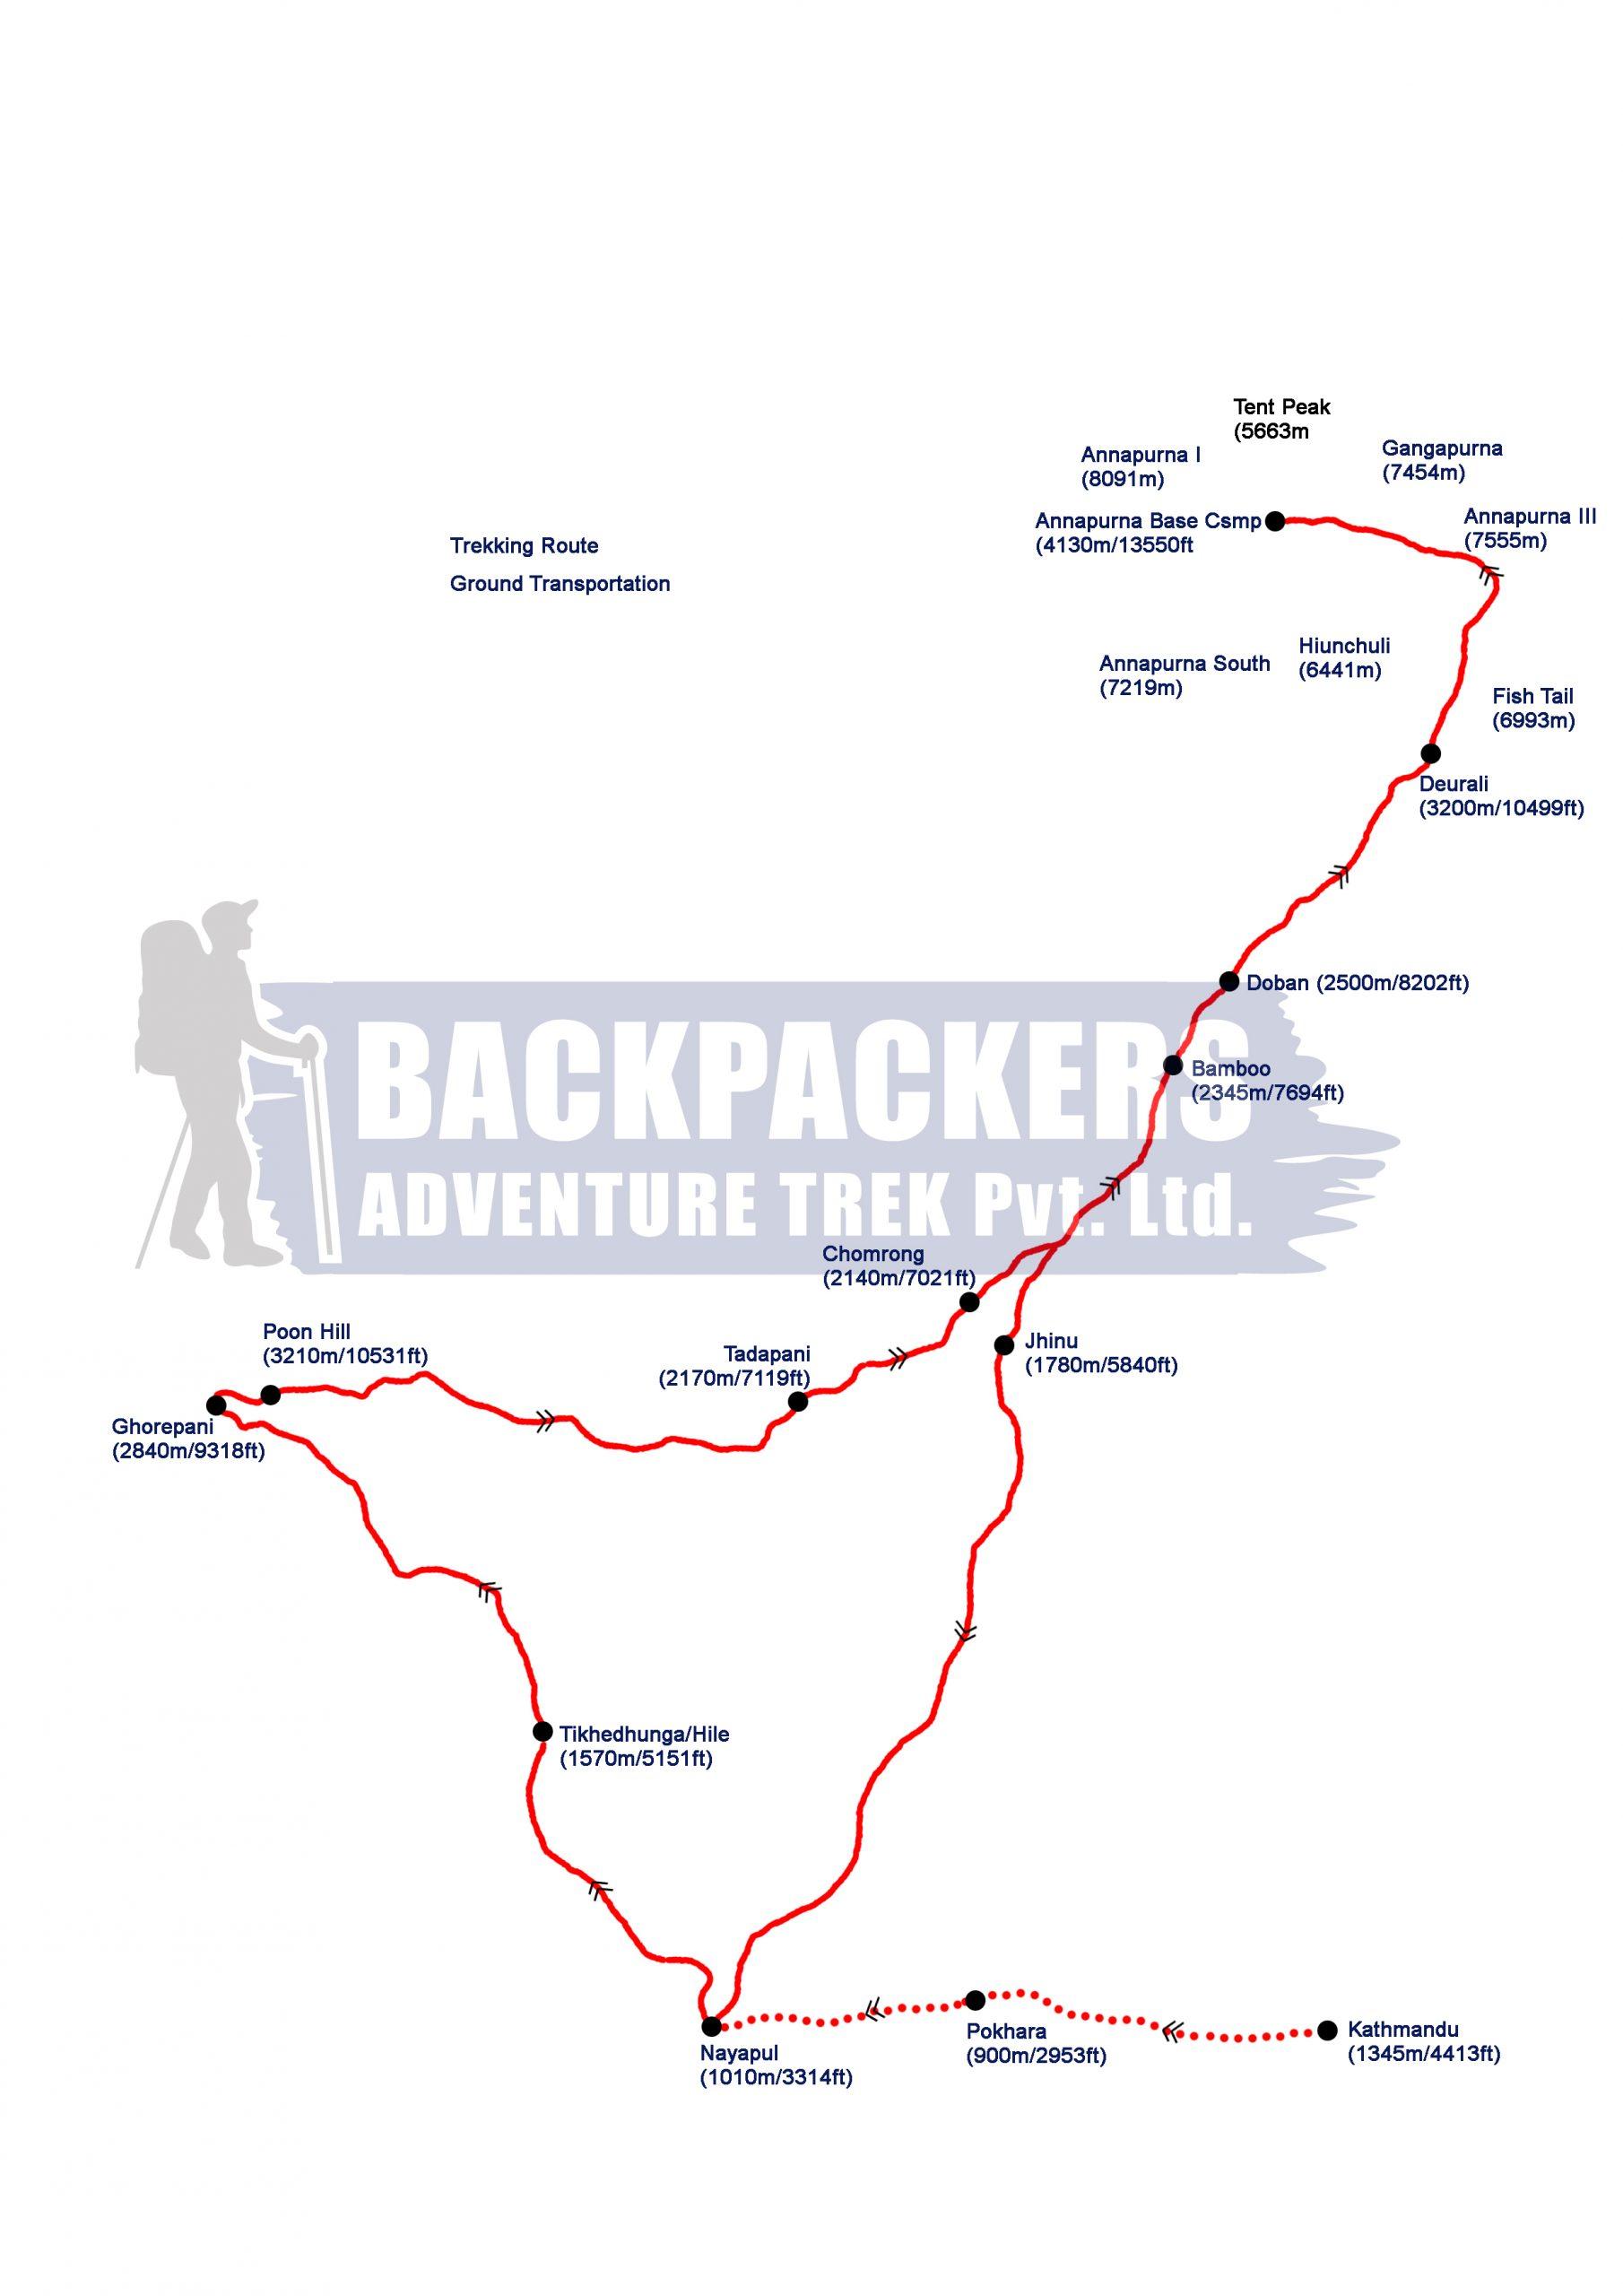 https://backpackersadventuretrek.com/wp-content/uploads/2020/09/a-scaled.jpg